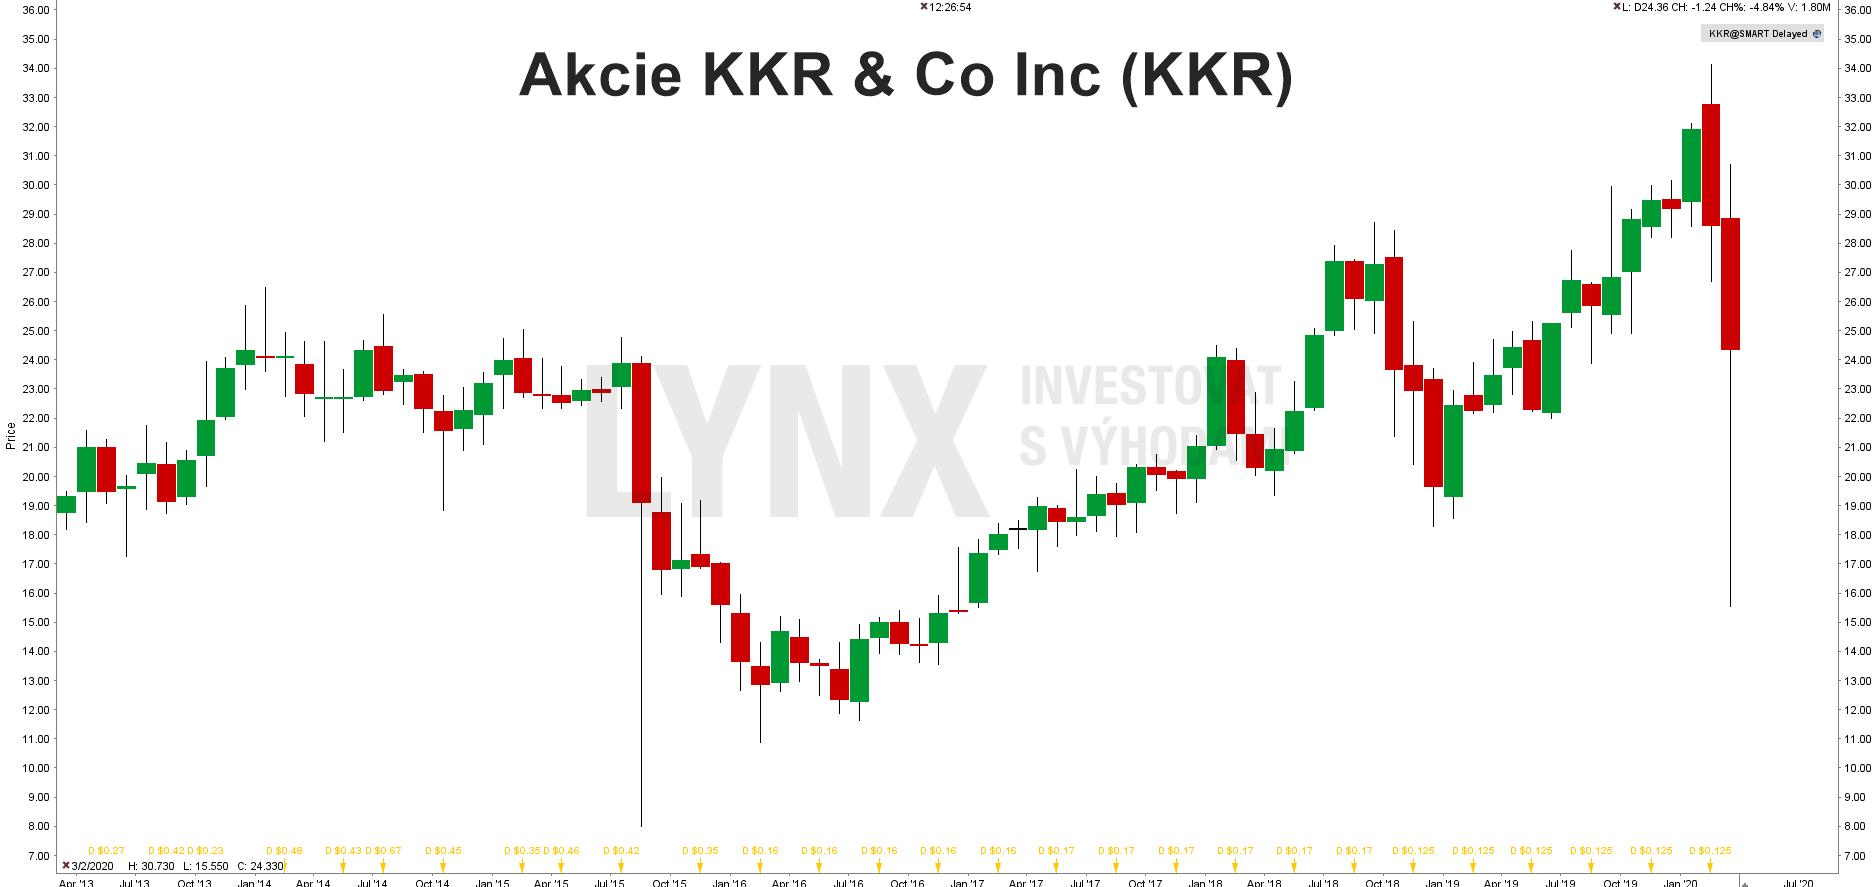 Akcie KKR & Co Inc (KKR)